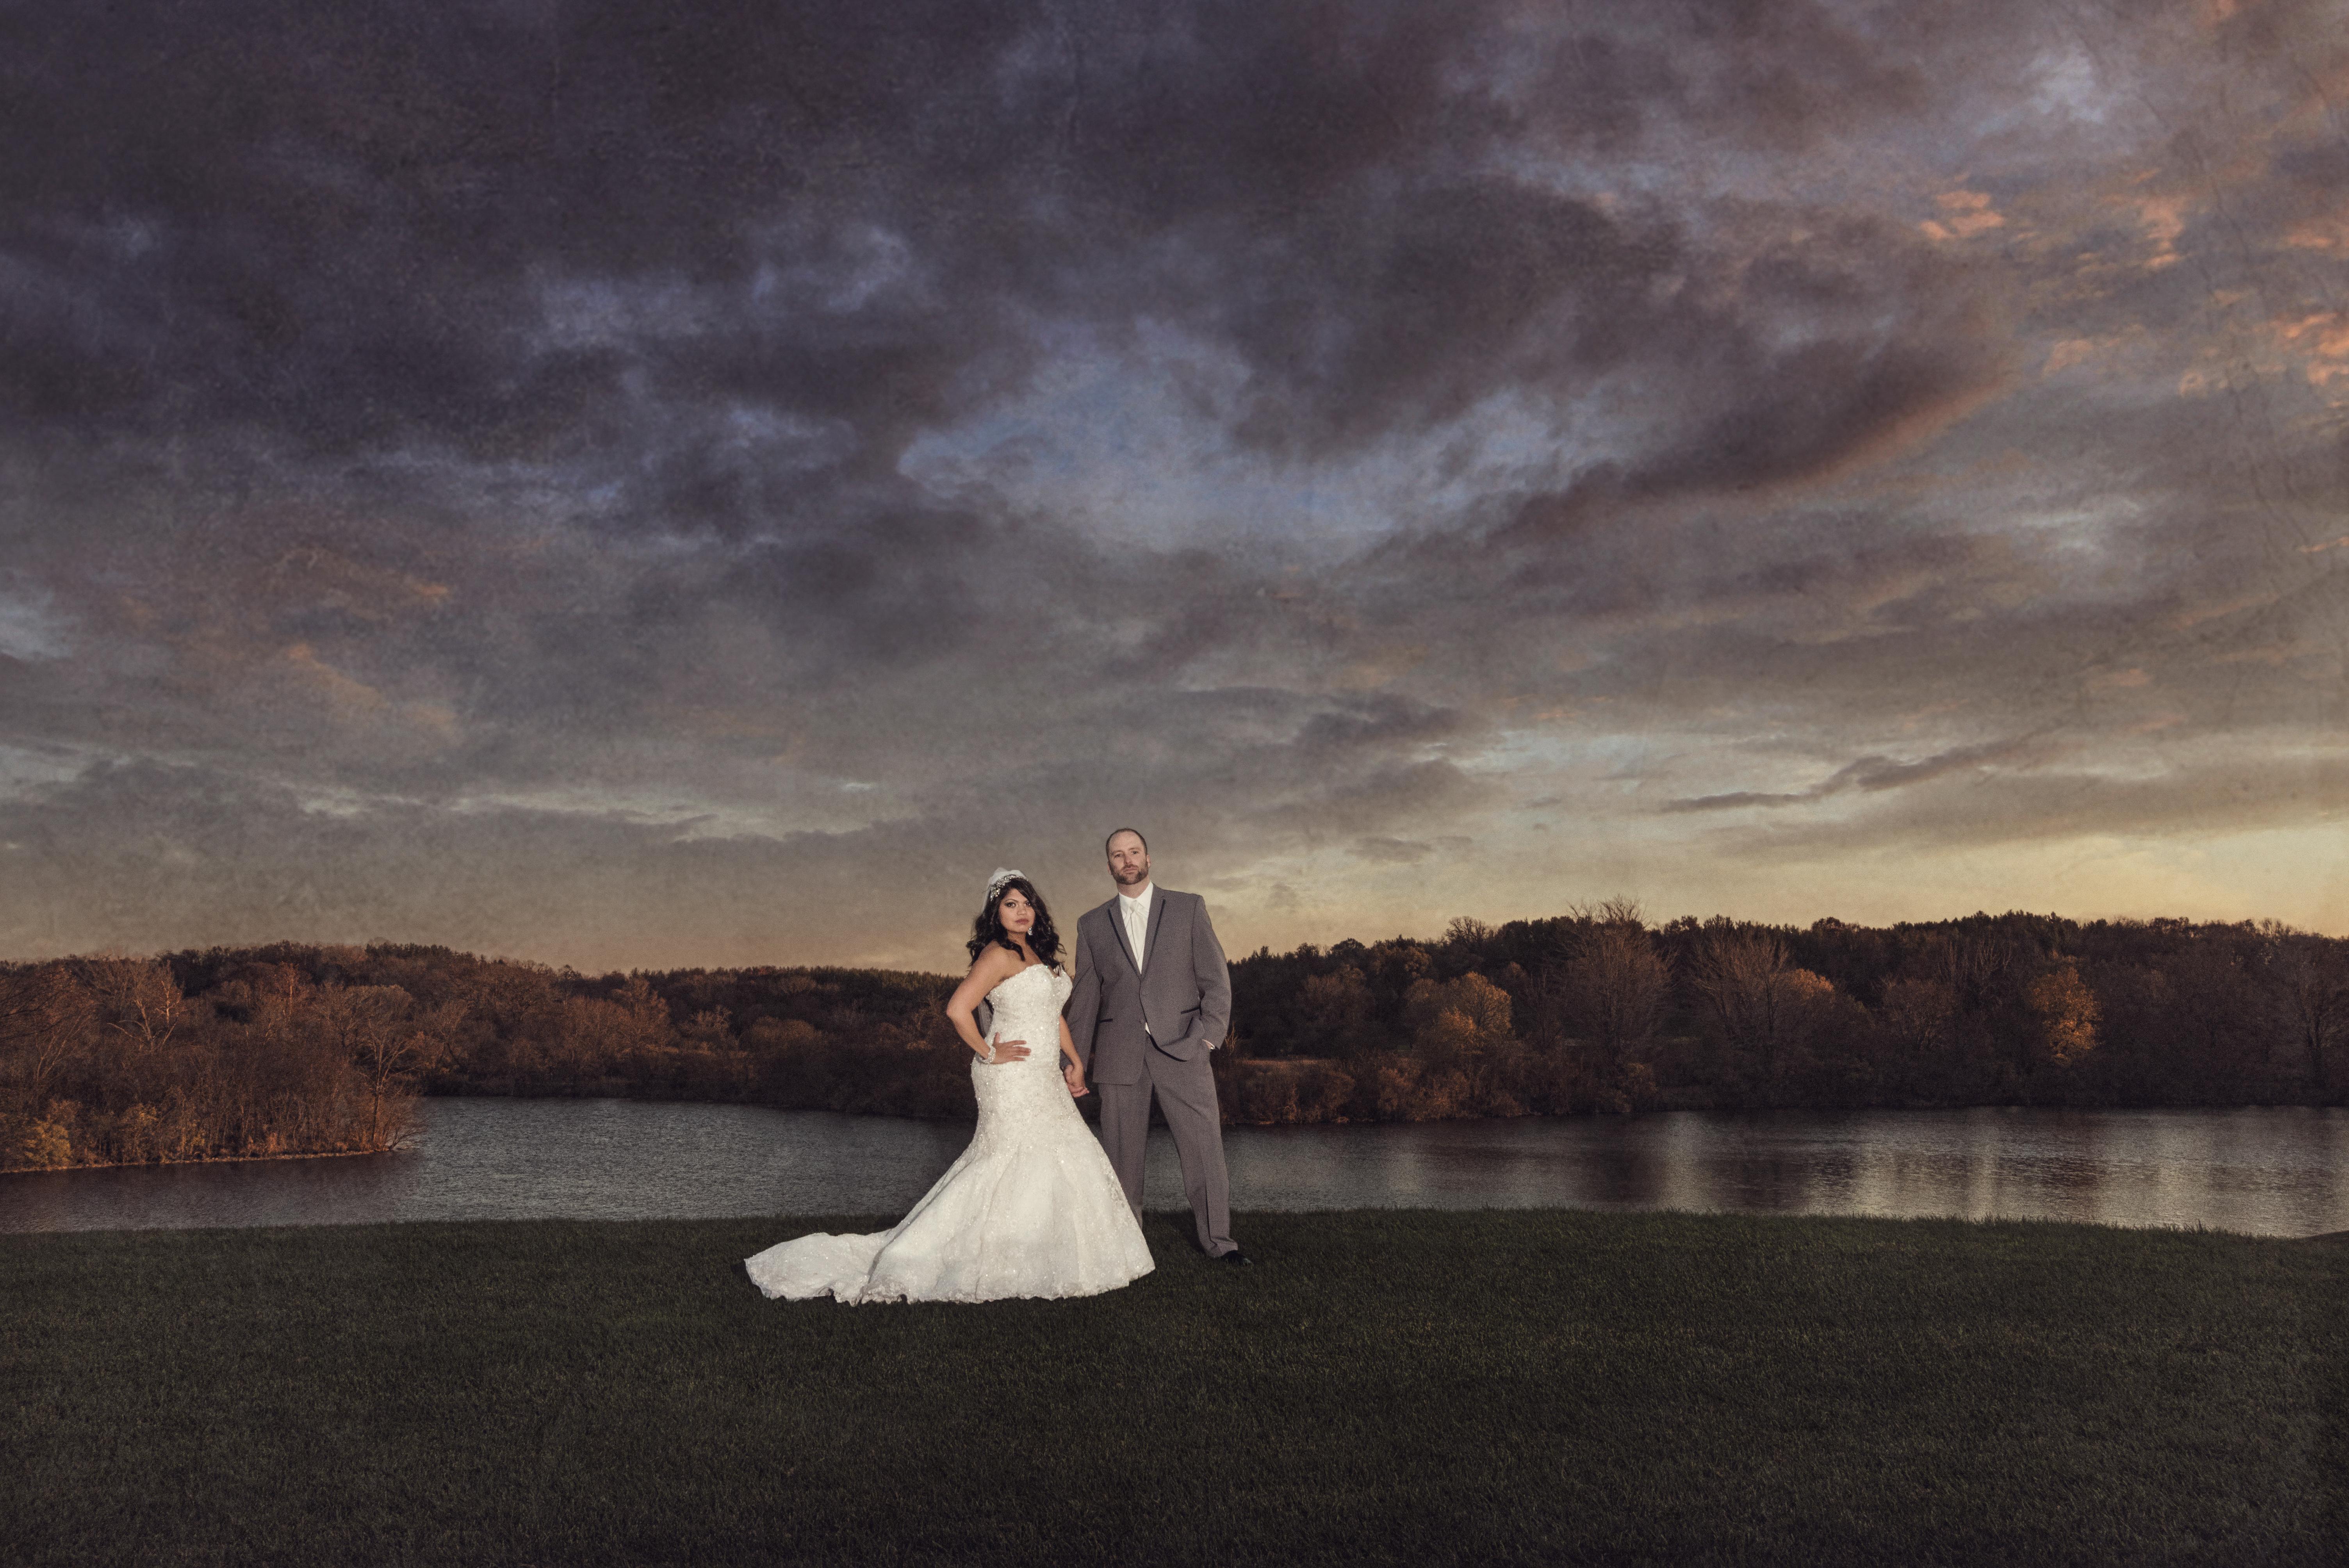 Artistic Wedding Image at Grand Geneva Resort in Lake Geneva Wisconsin.